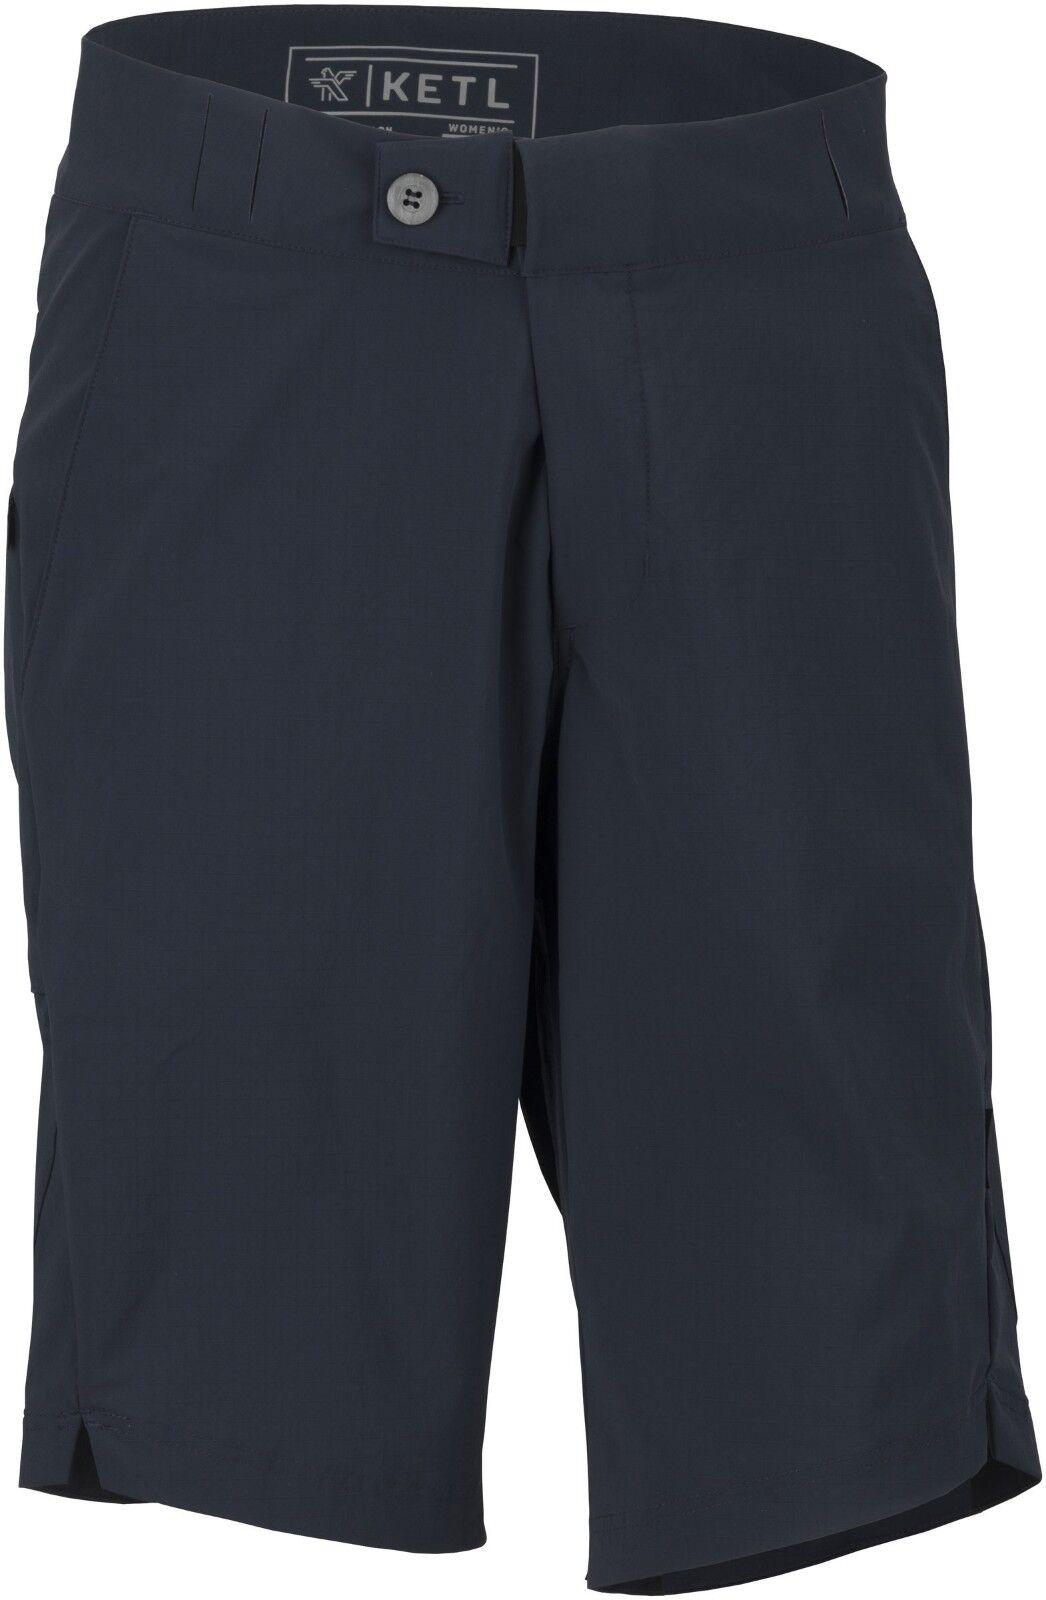 Ketl ligero mínima overshort, Para Hombre XL, pantalones cortos para Ciclismo, azul marino